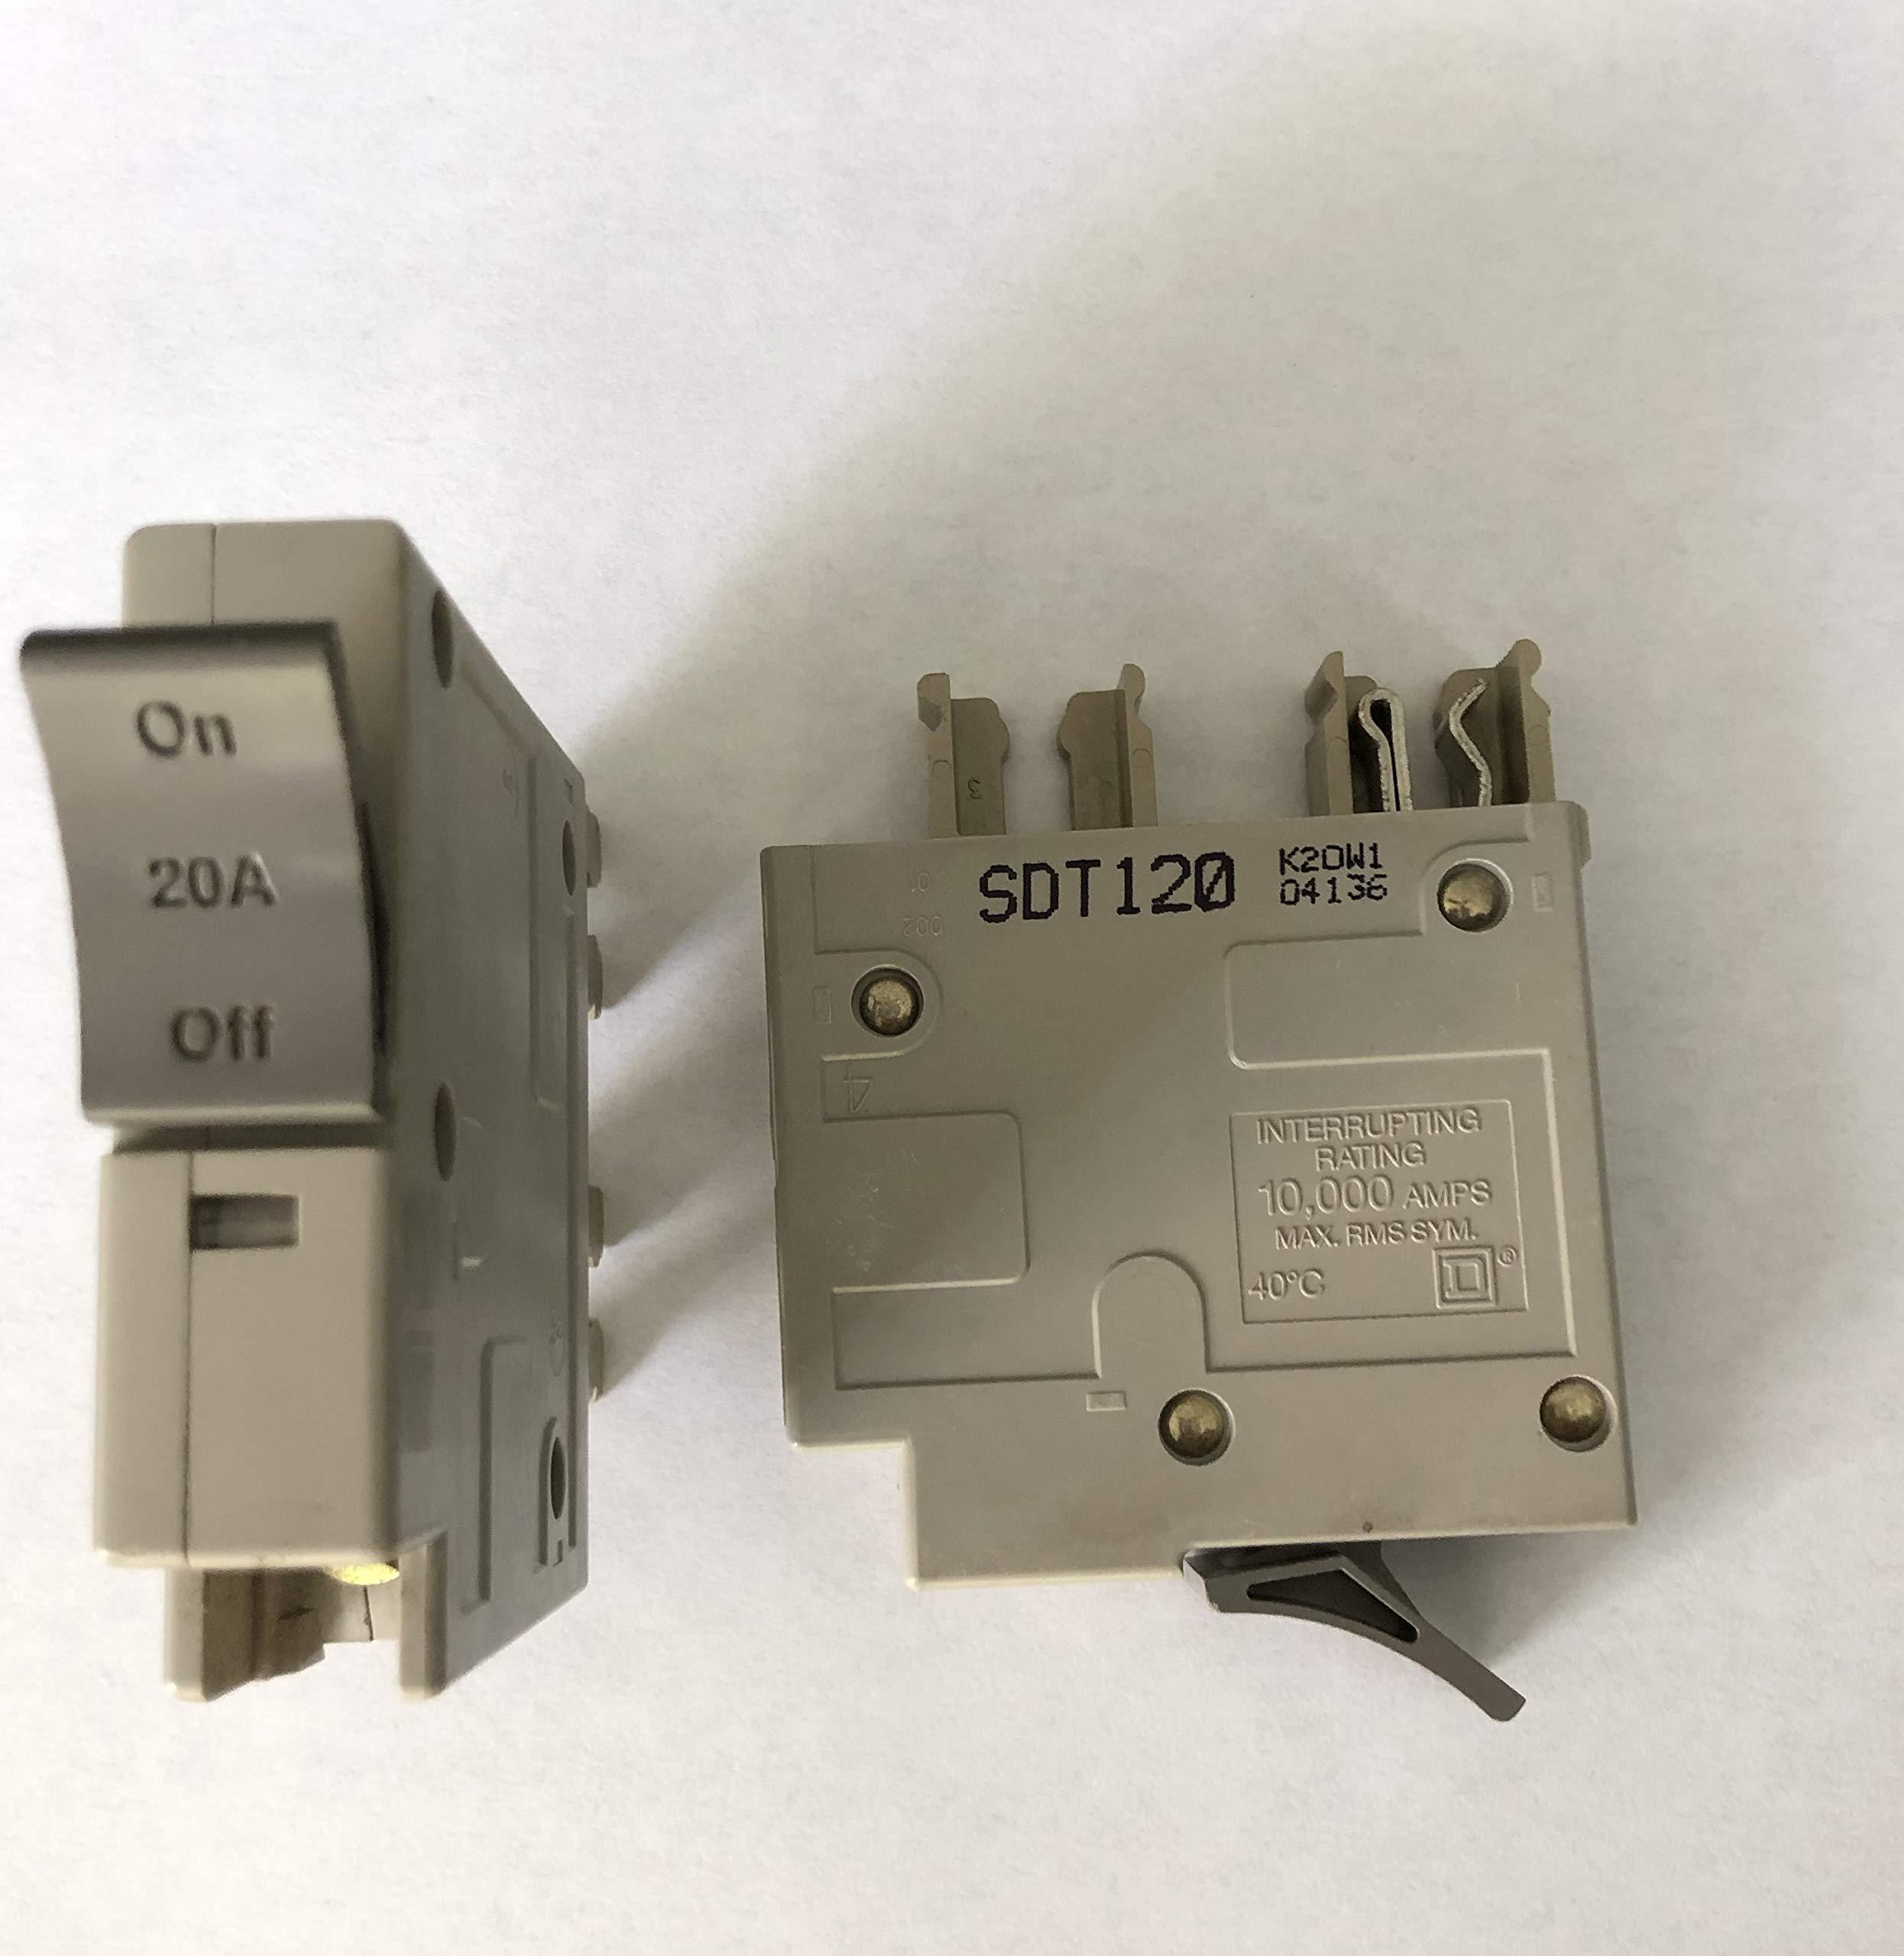 Square D Trilliant 20 amp Single Pole Circuit Breaker SDT120 by Trilliant